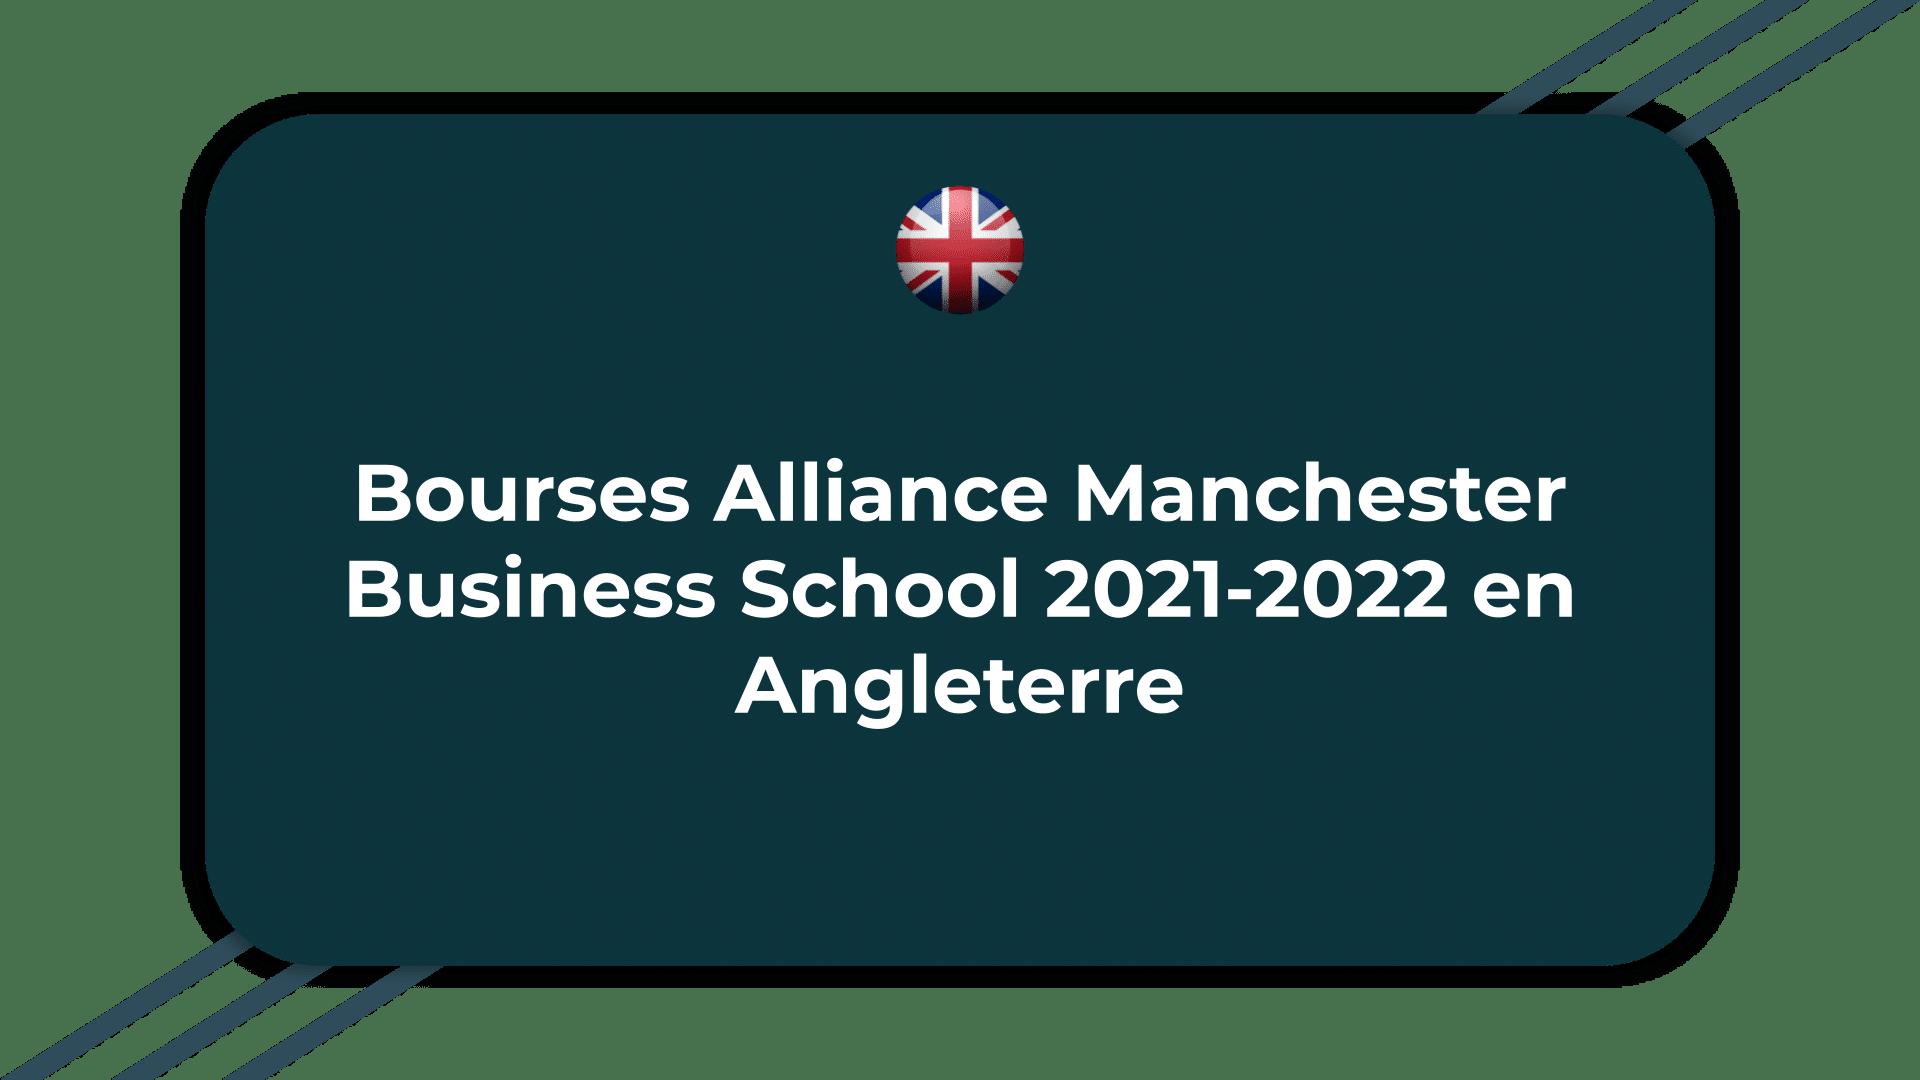 Bourses Alliance Manchester Business School